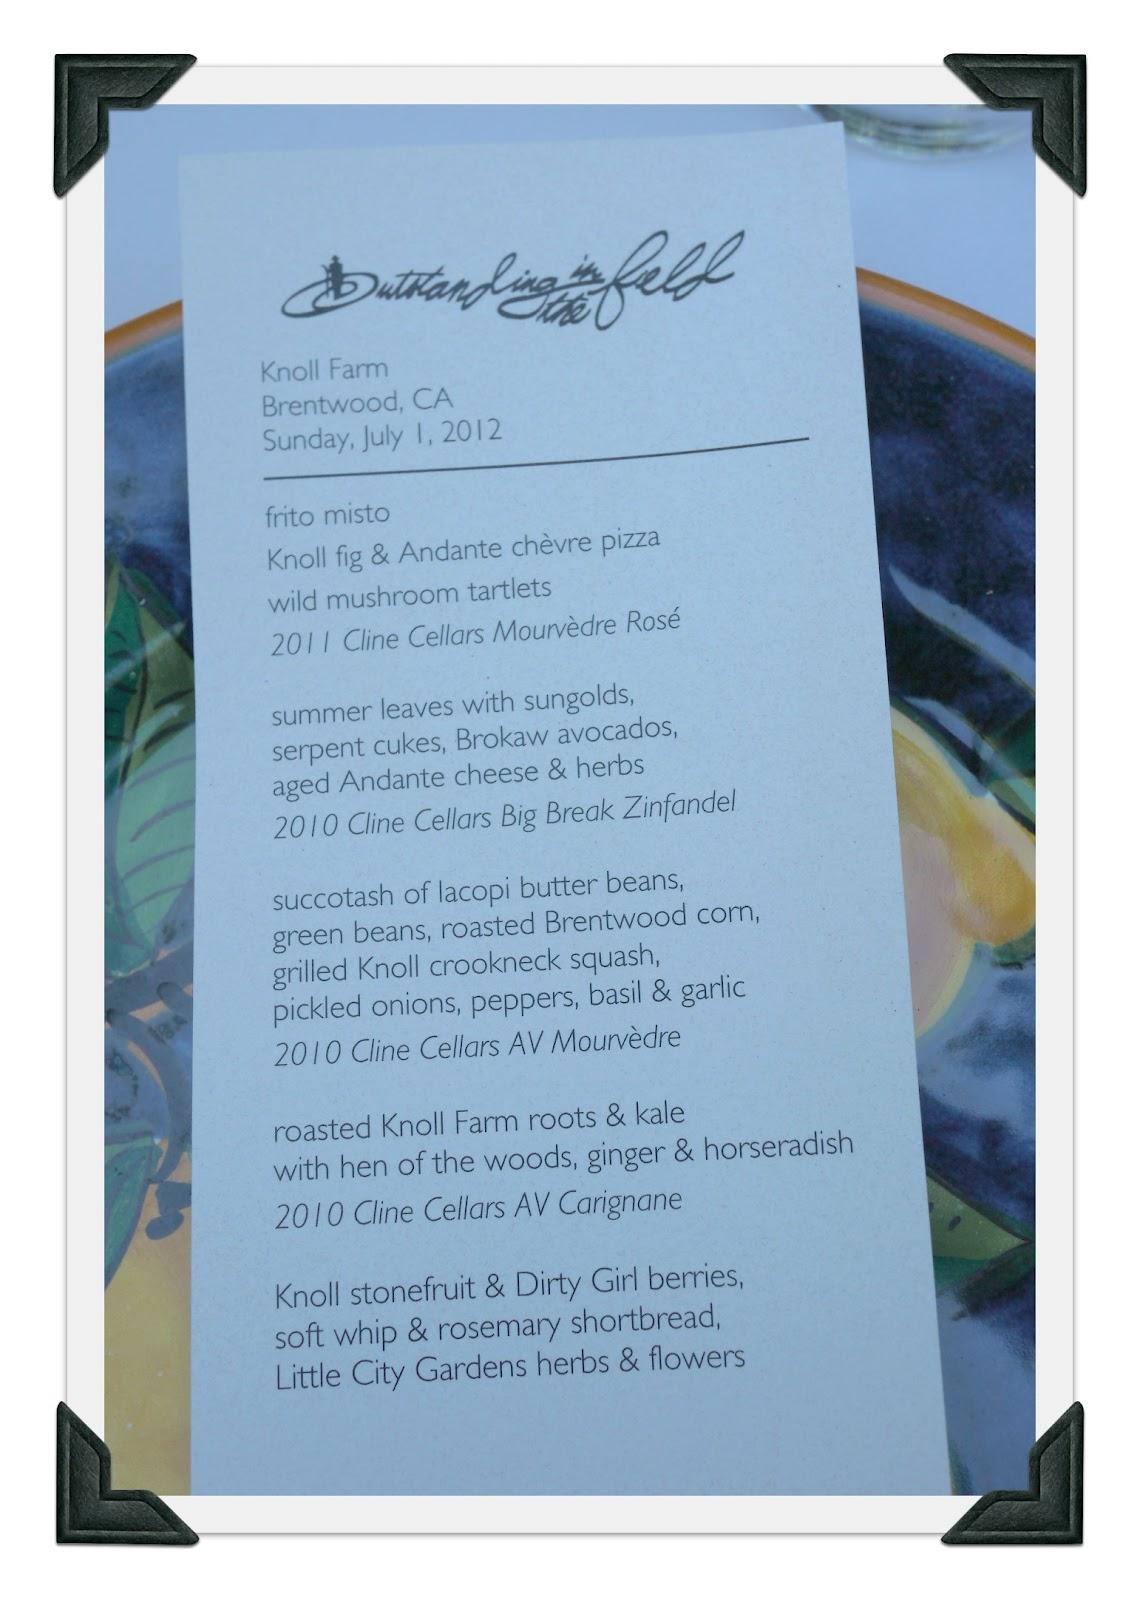 Food Recipes, Local Restaurants | www.funfeasts.com: Bay Area Day Trips